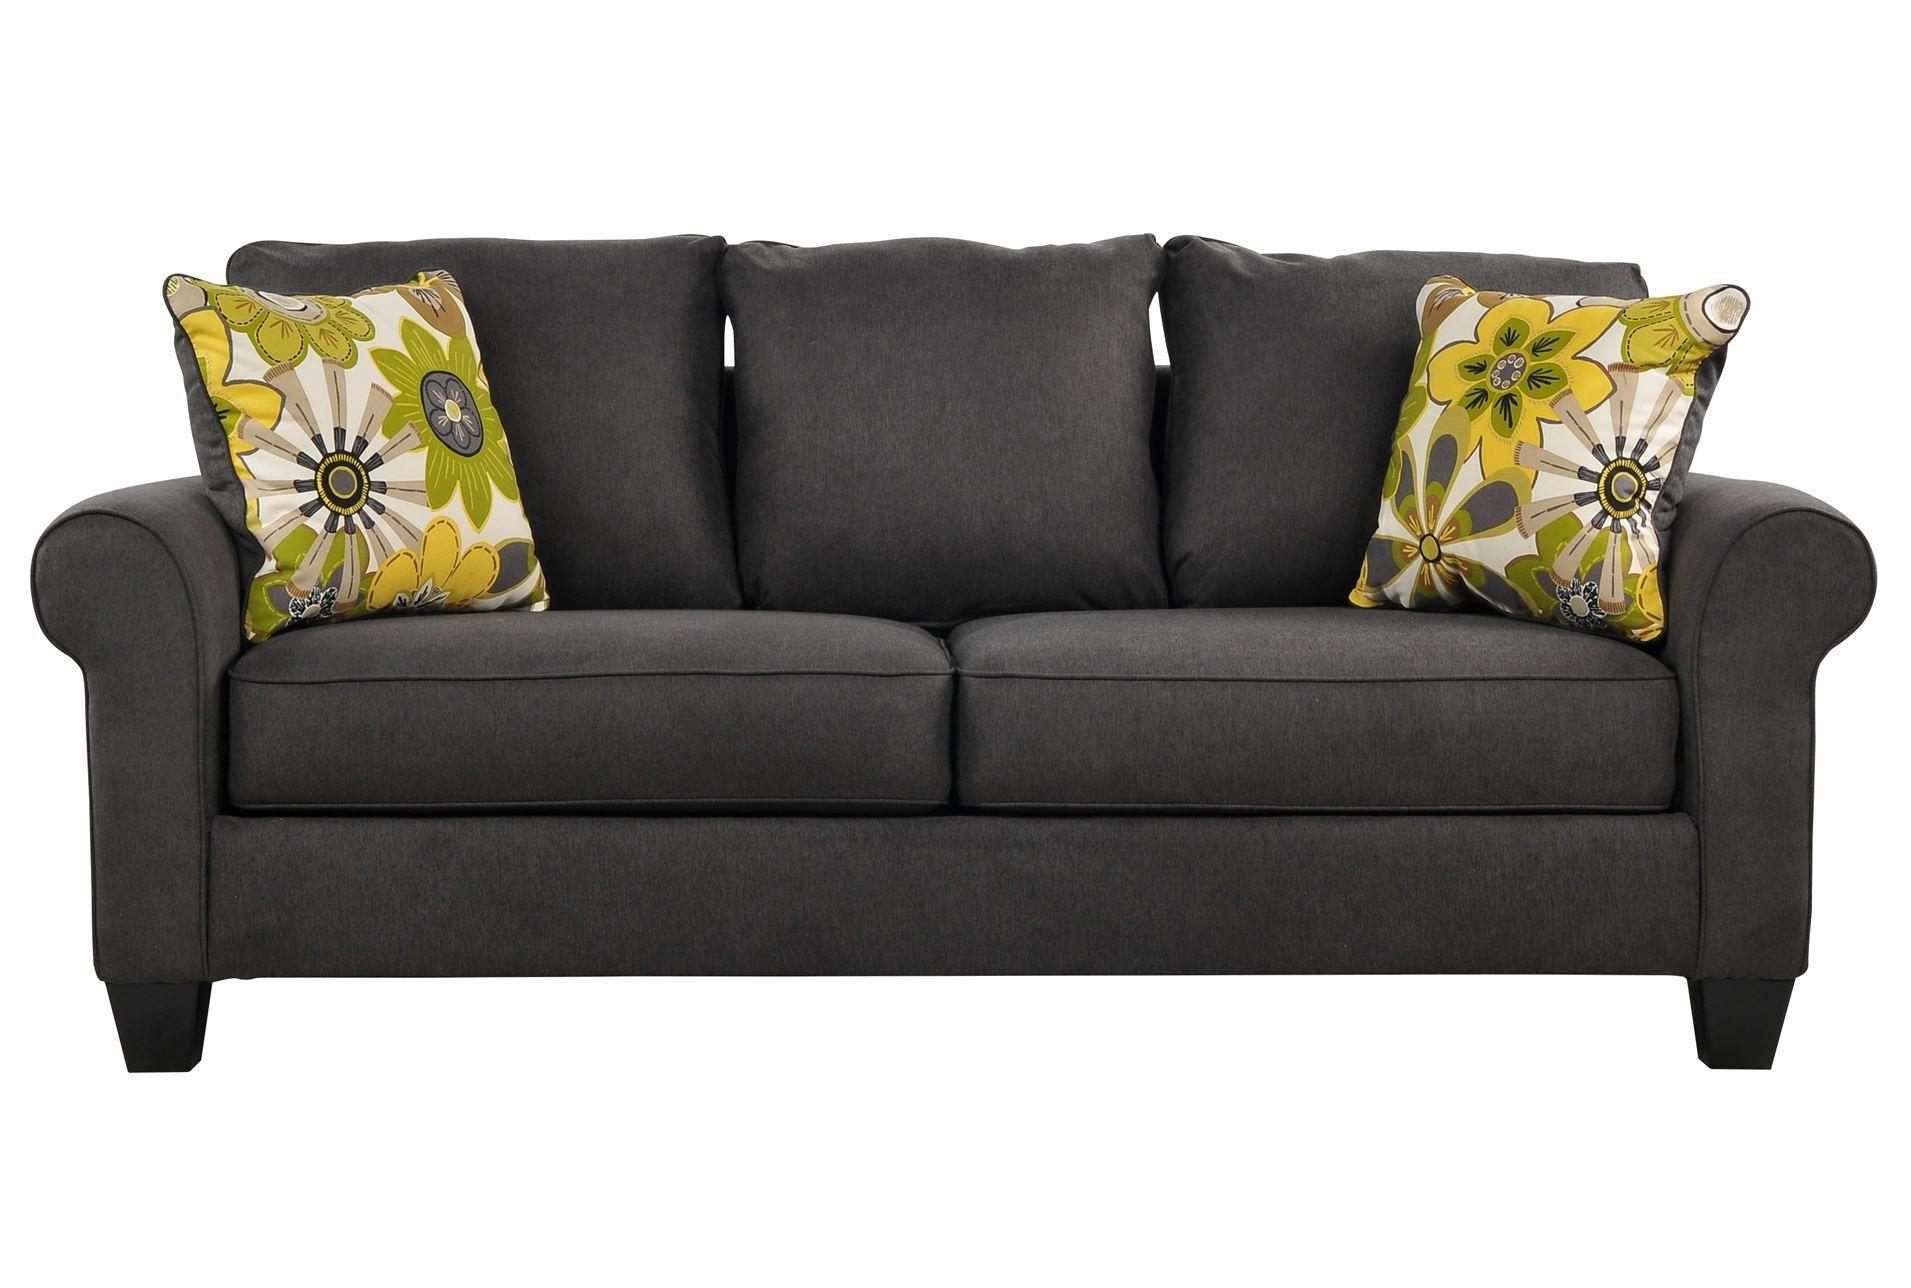 Nolana Charcoal Sofa Living Room With Charcoal Sofa Luxury